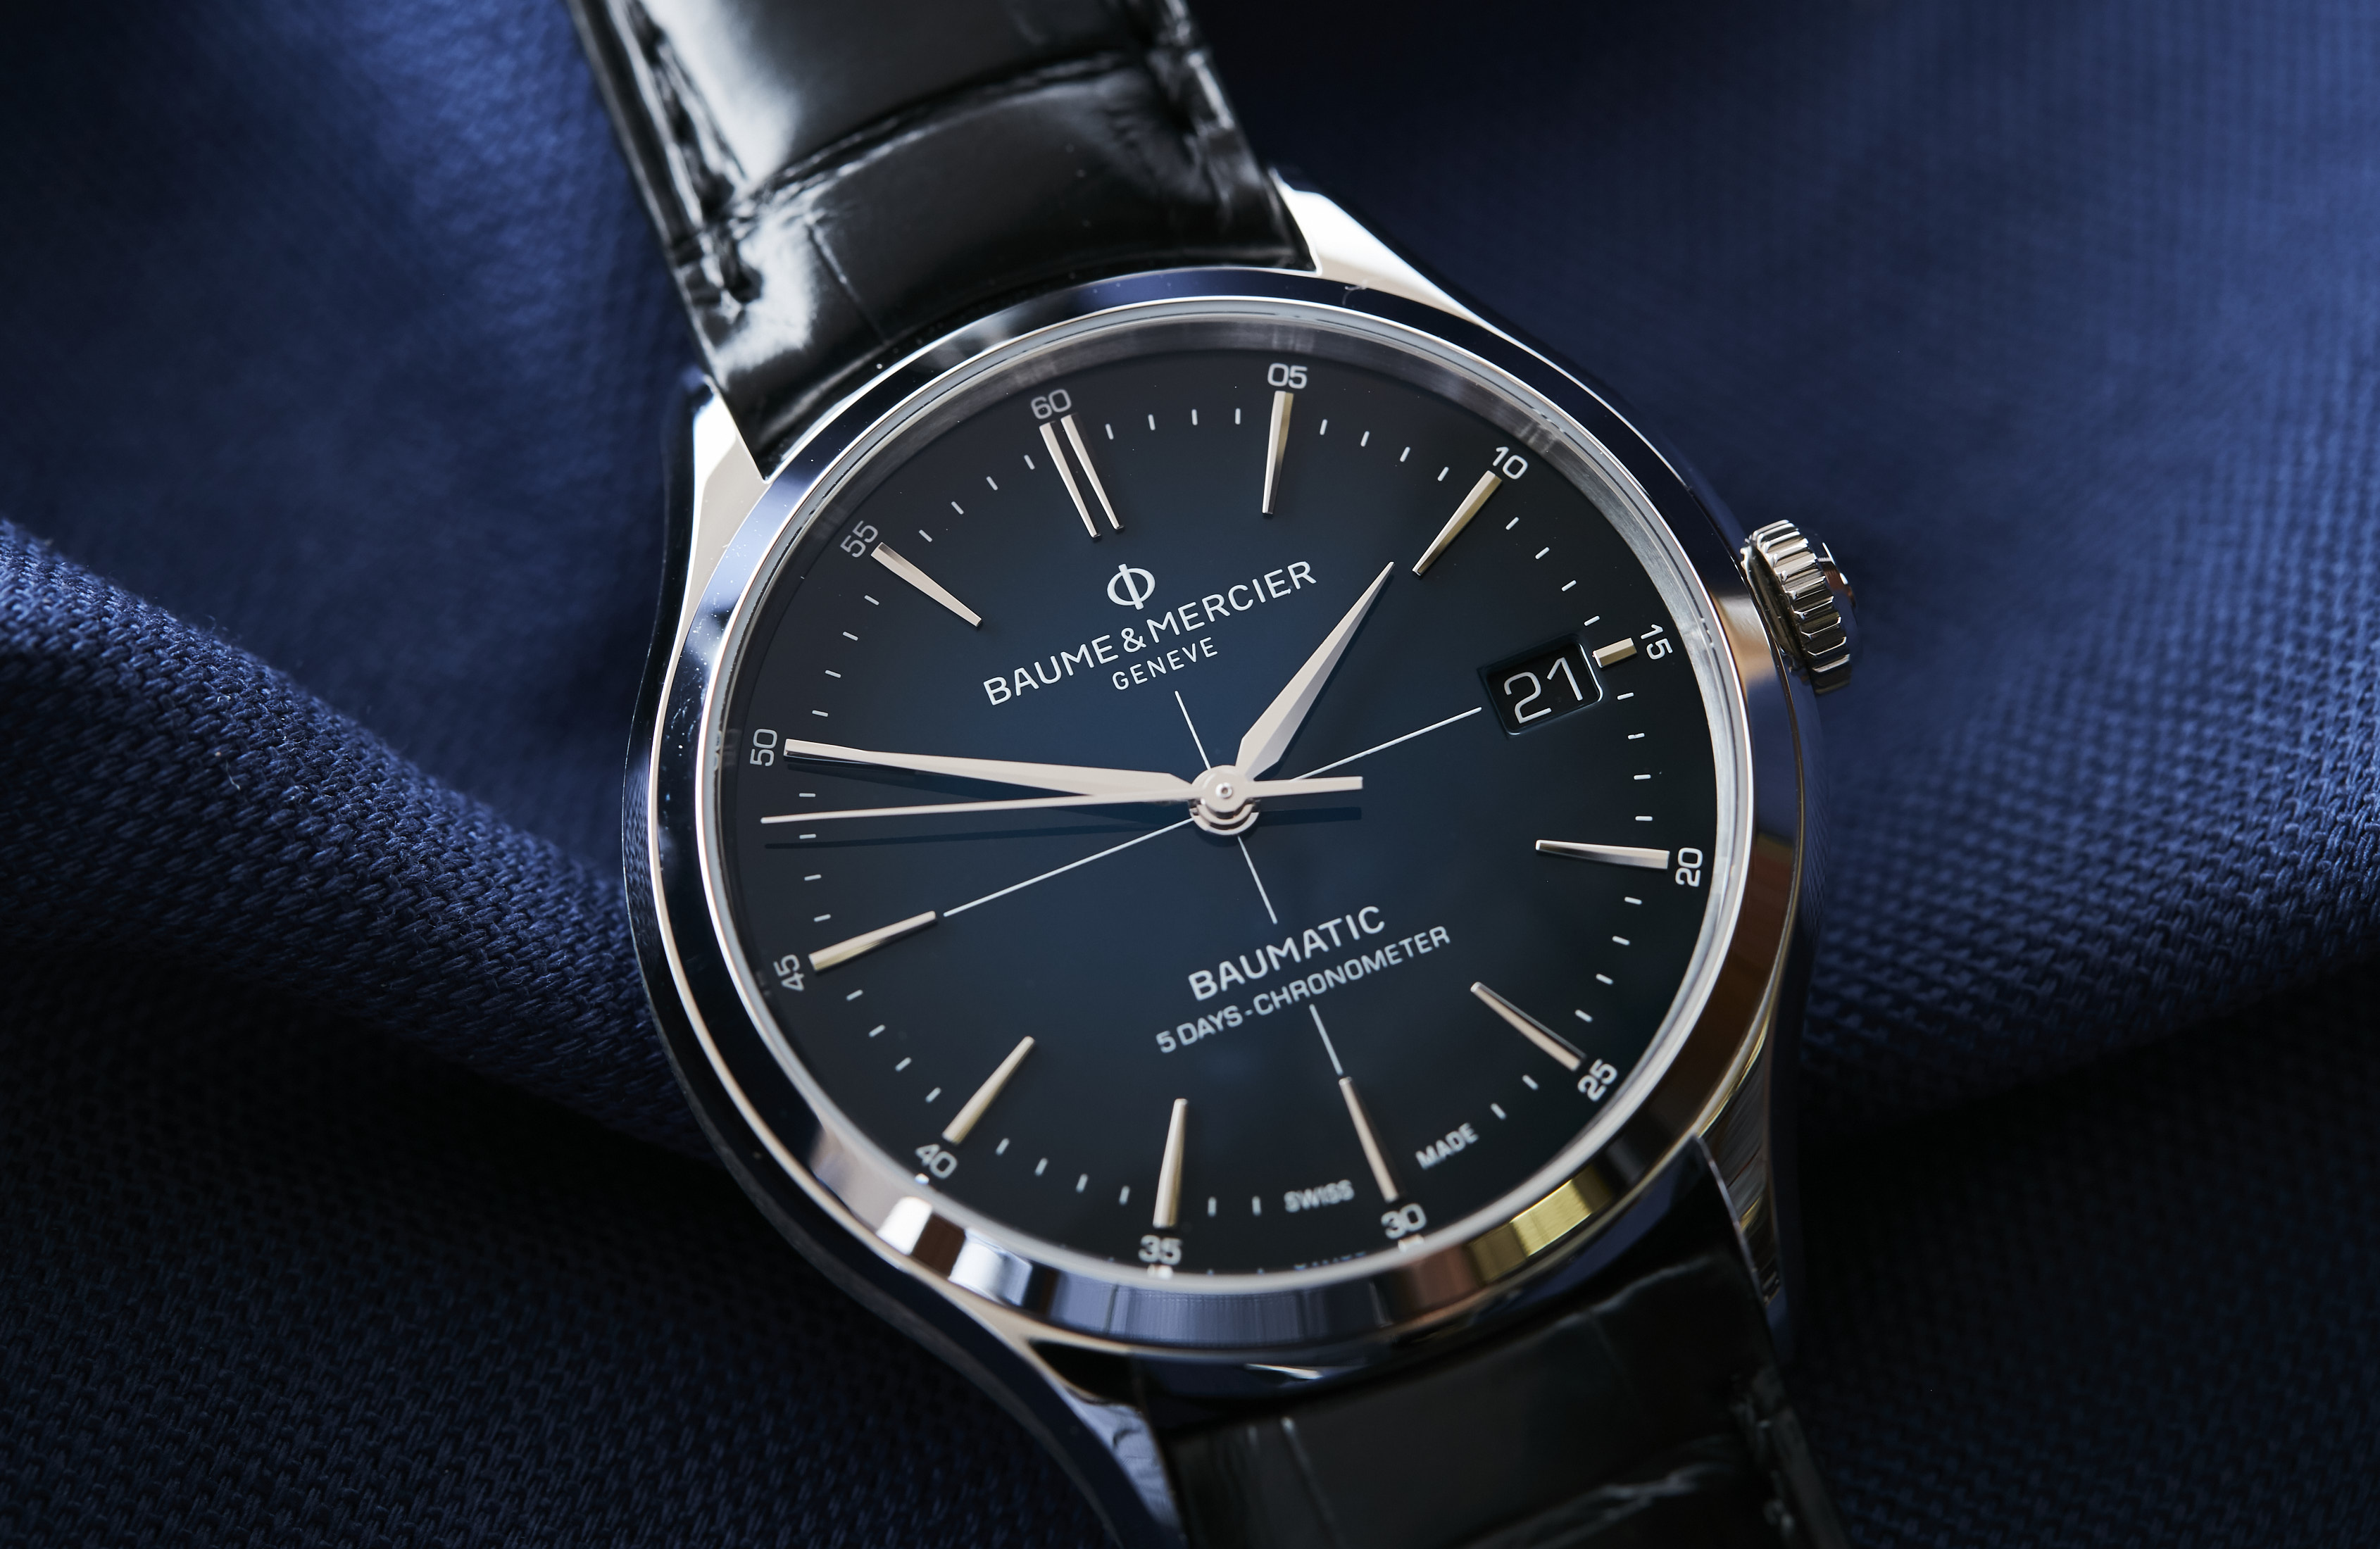 Baume & Mercier Clifton Baumatic 10467 Review